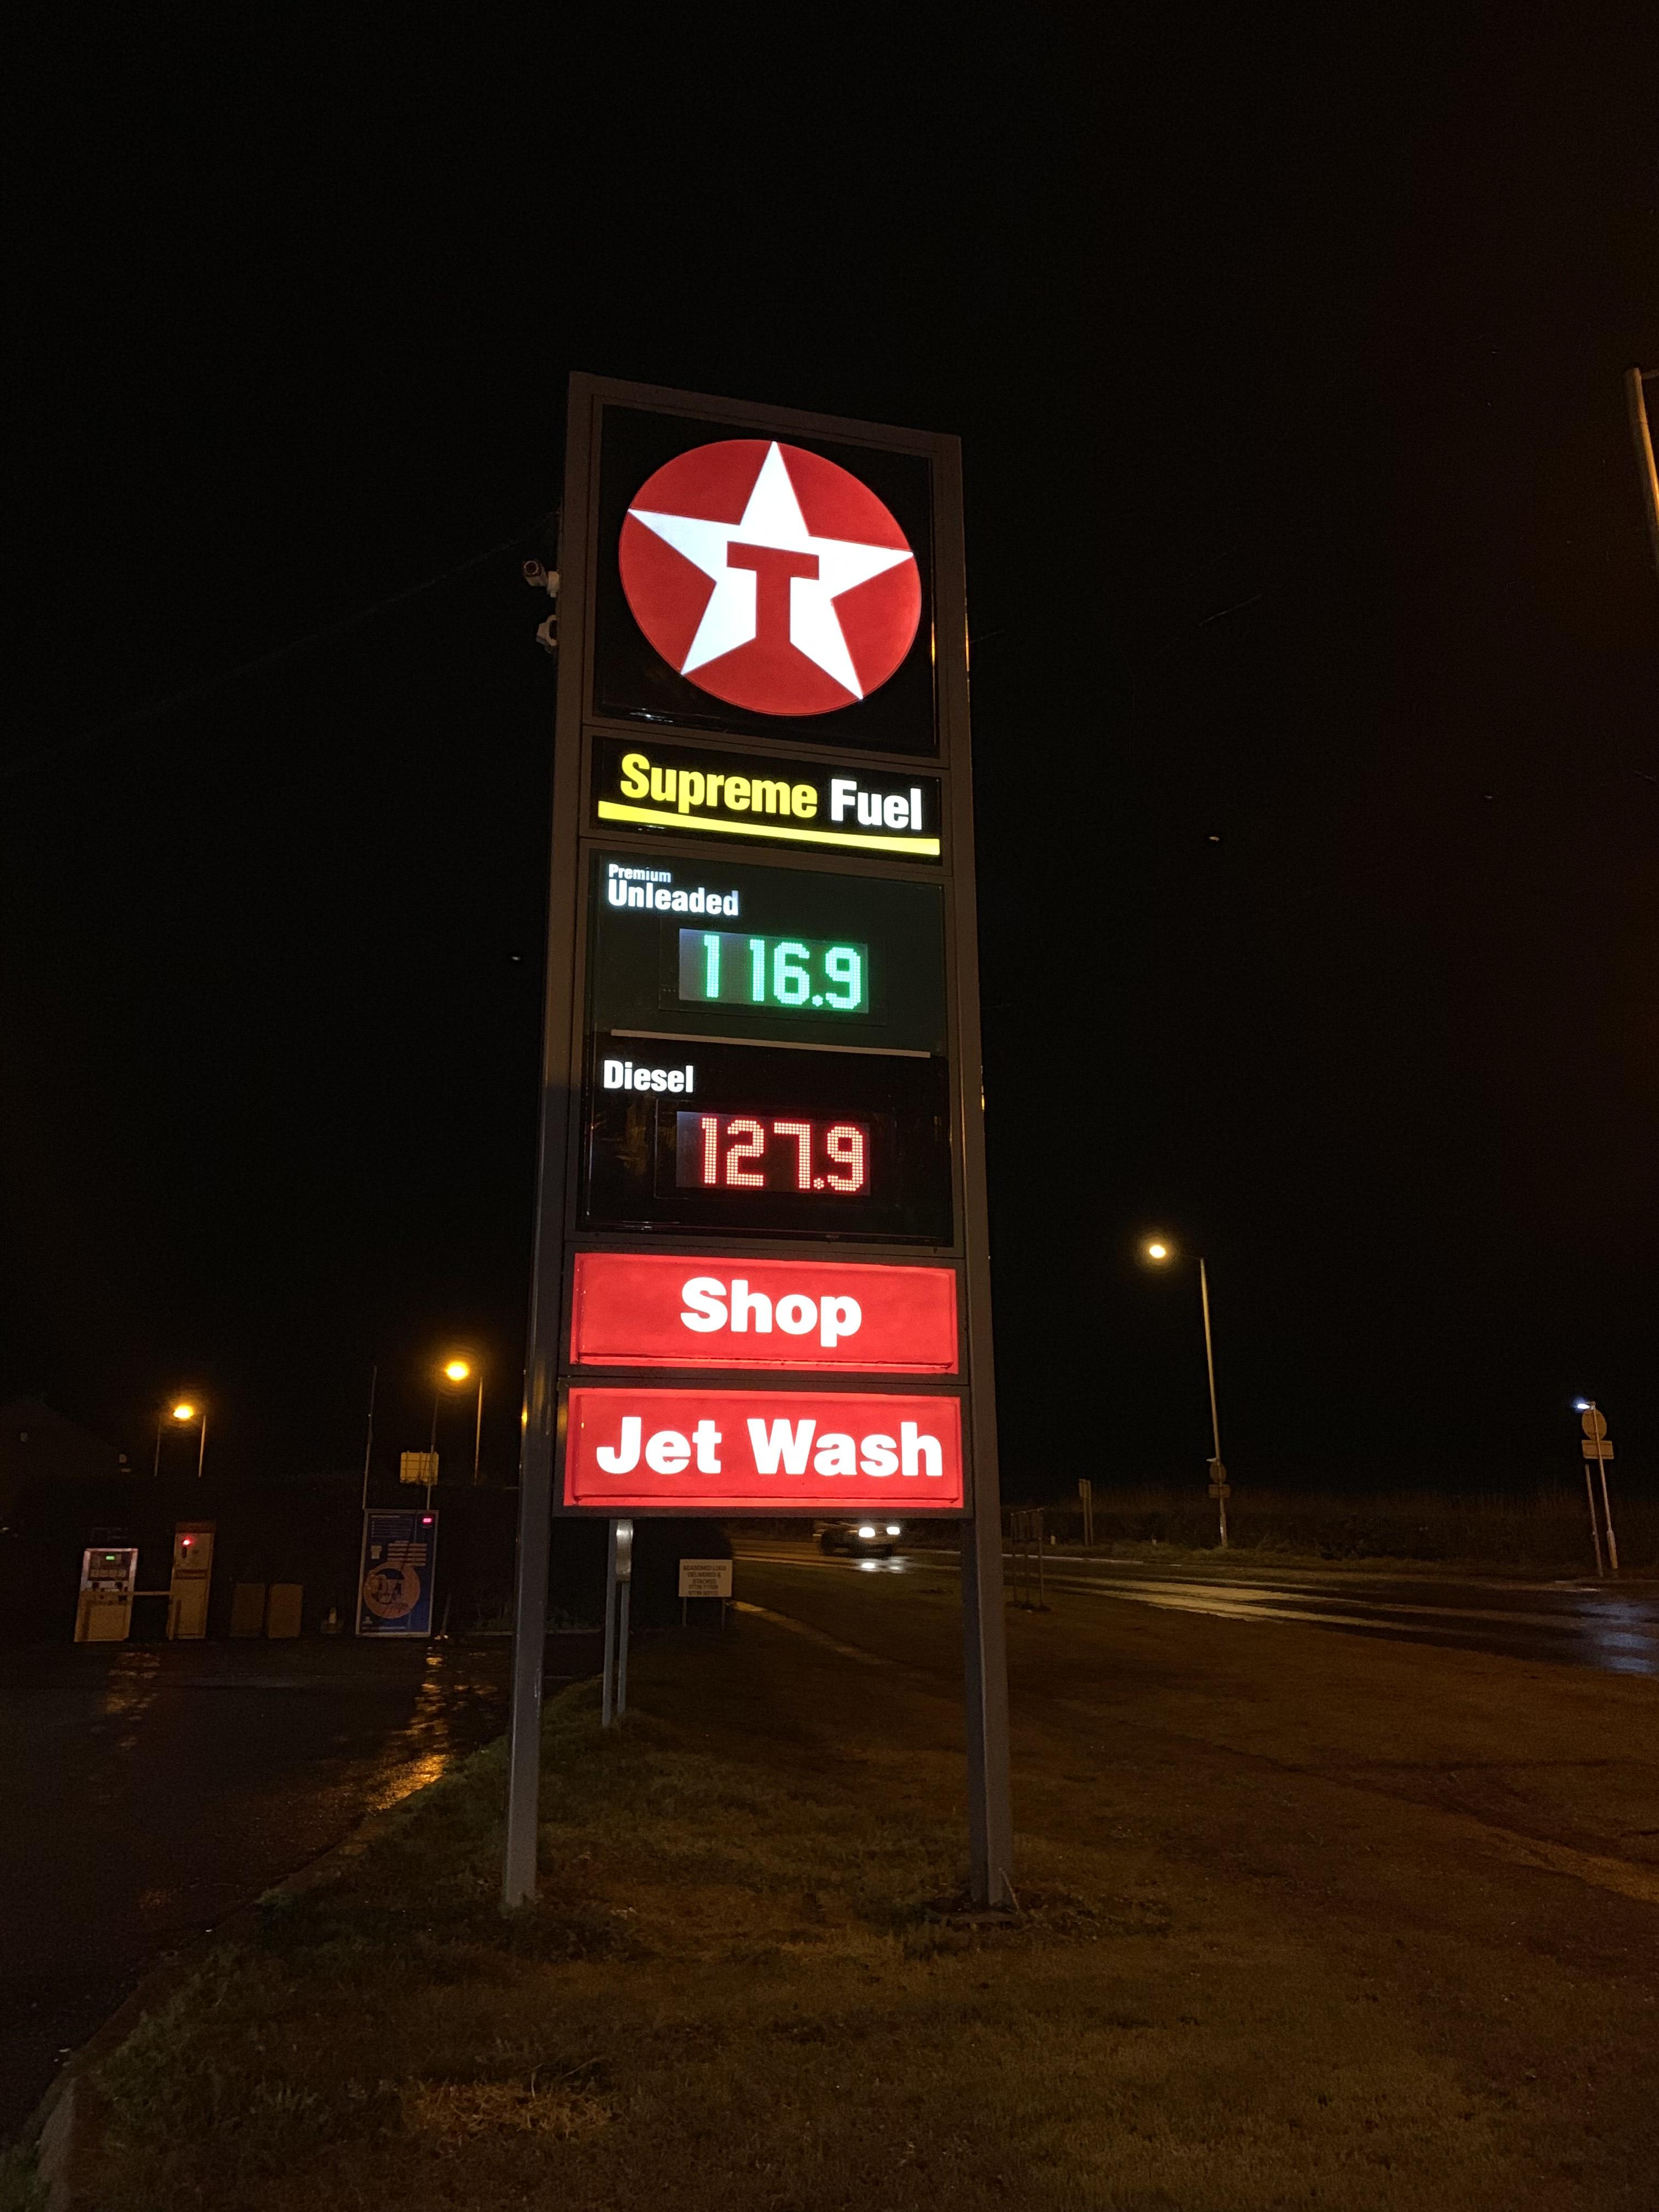 Cheap Texaco Fuel - £1.16.9 (Shropshire)